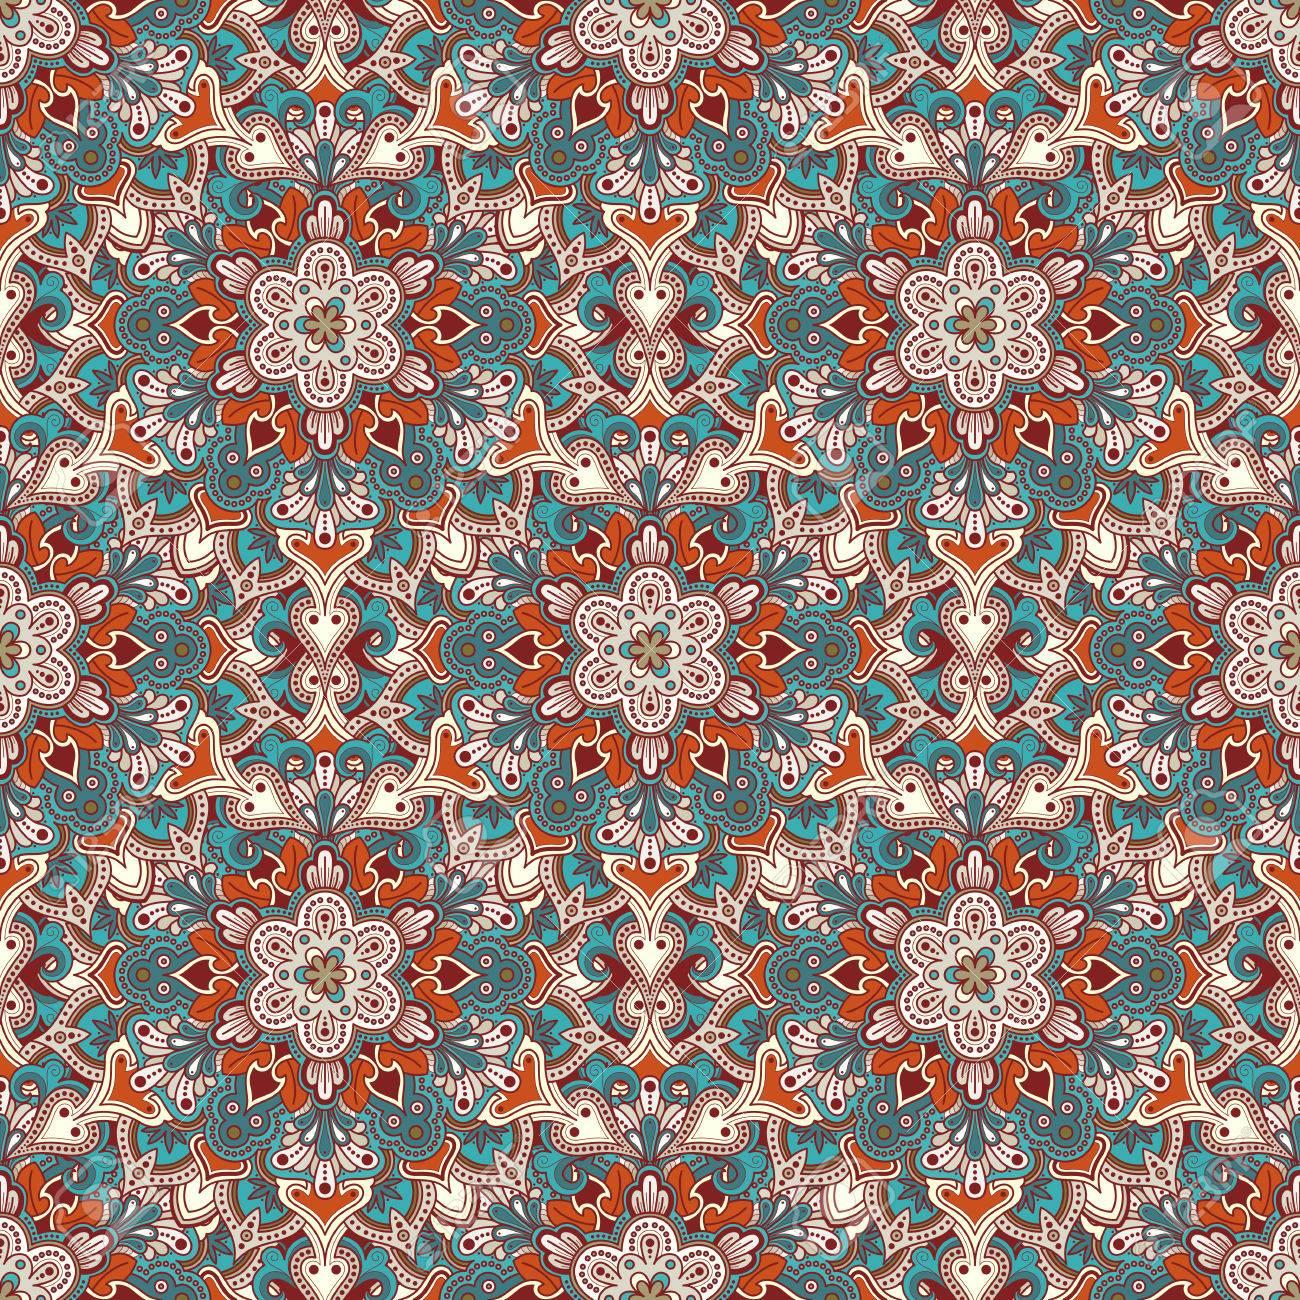 boho stil blume nahtlose muster fliesen mandala design am besten fr druckgewebe oder - Boho Muster